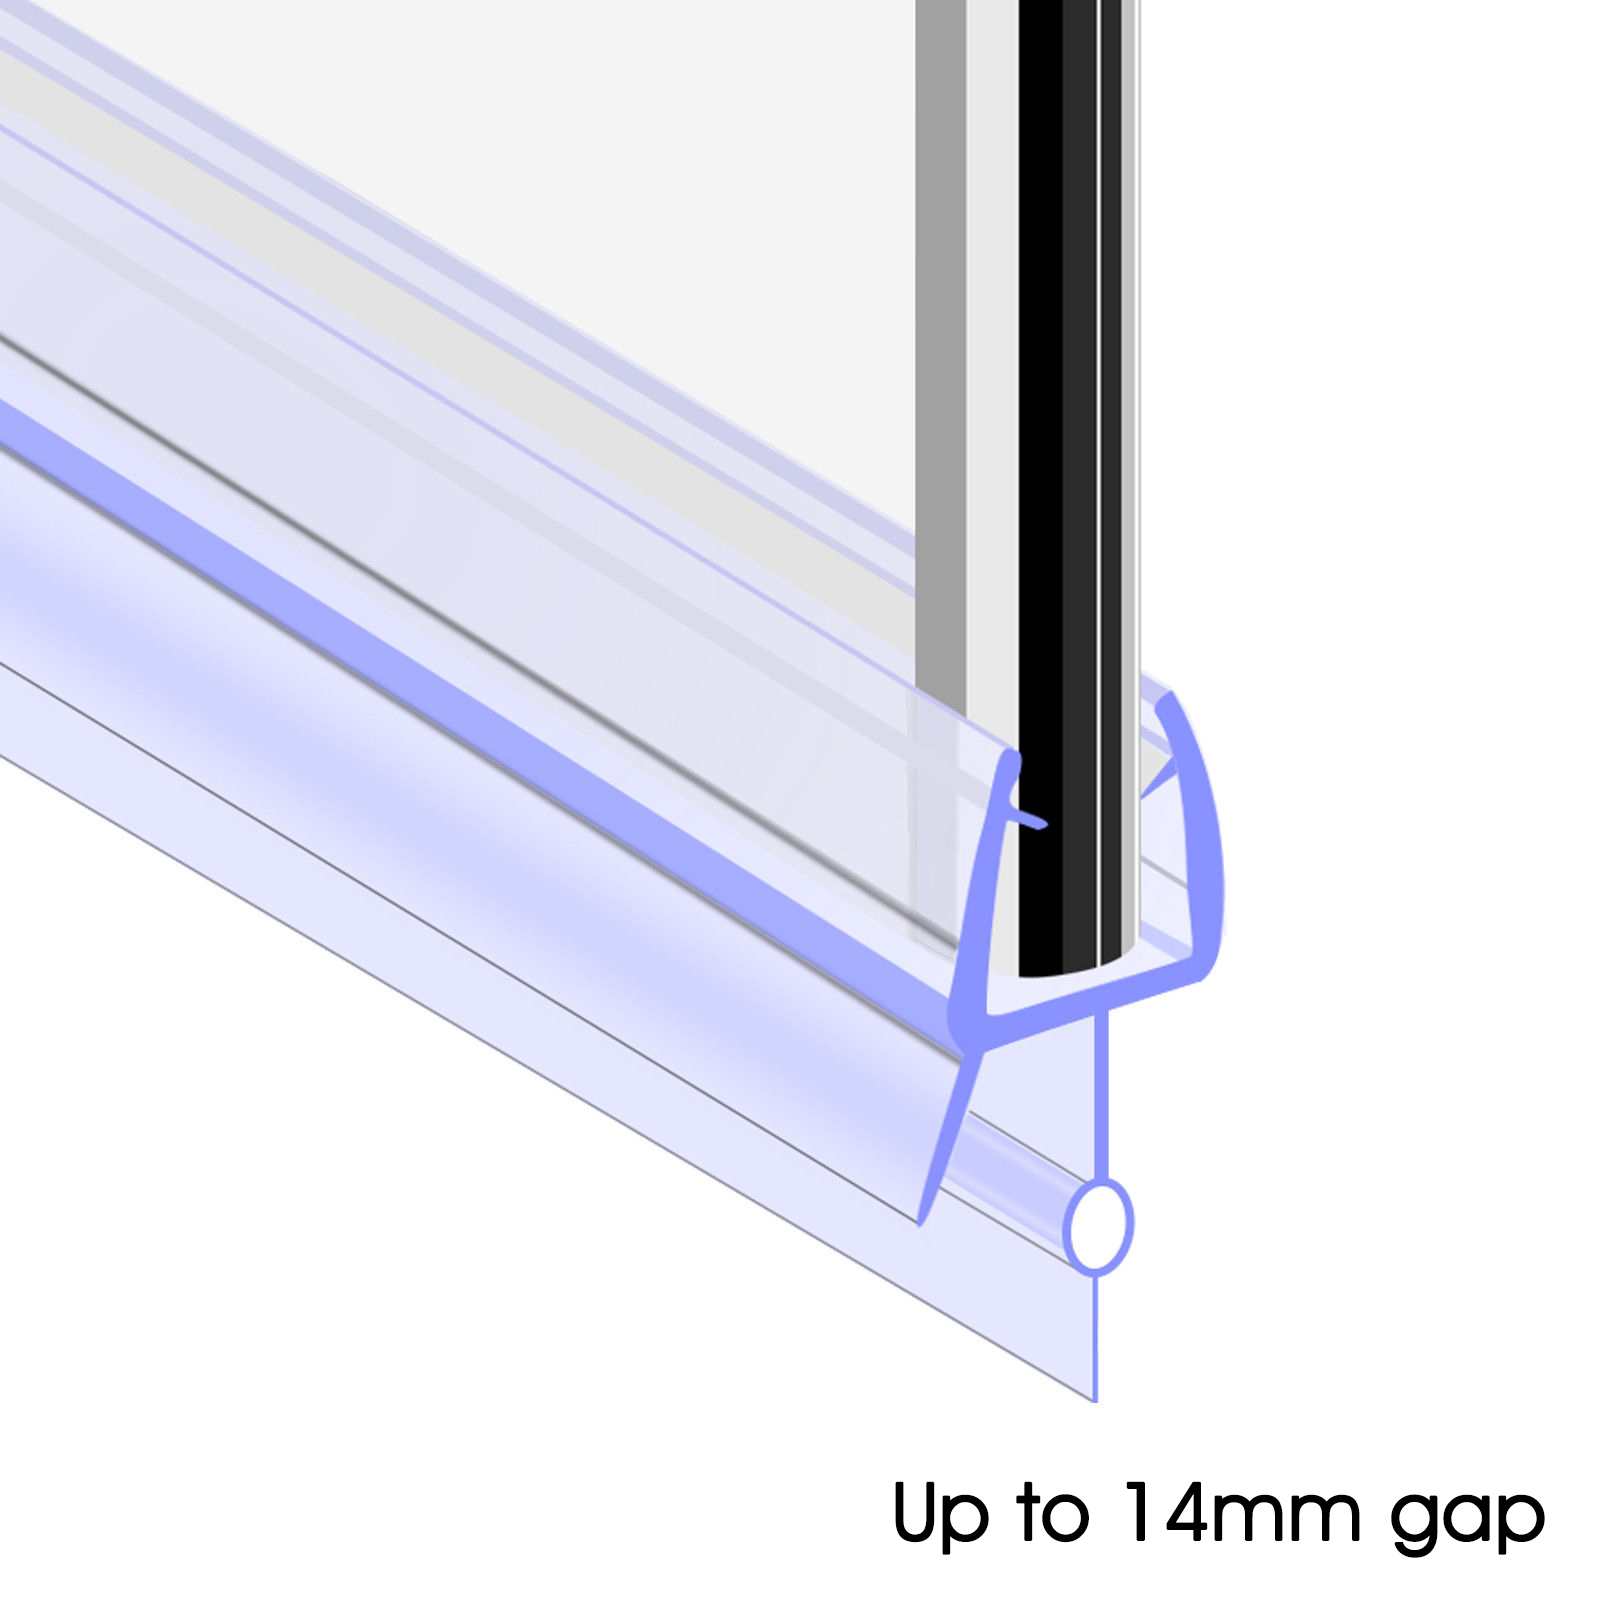 Home Furniture Diy Gap 14mm Rubber Bath Shower Screen